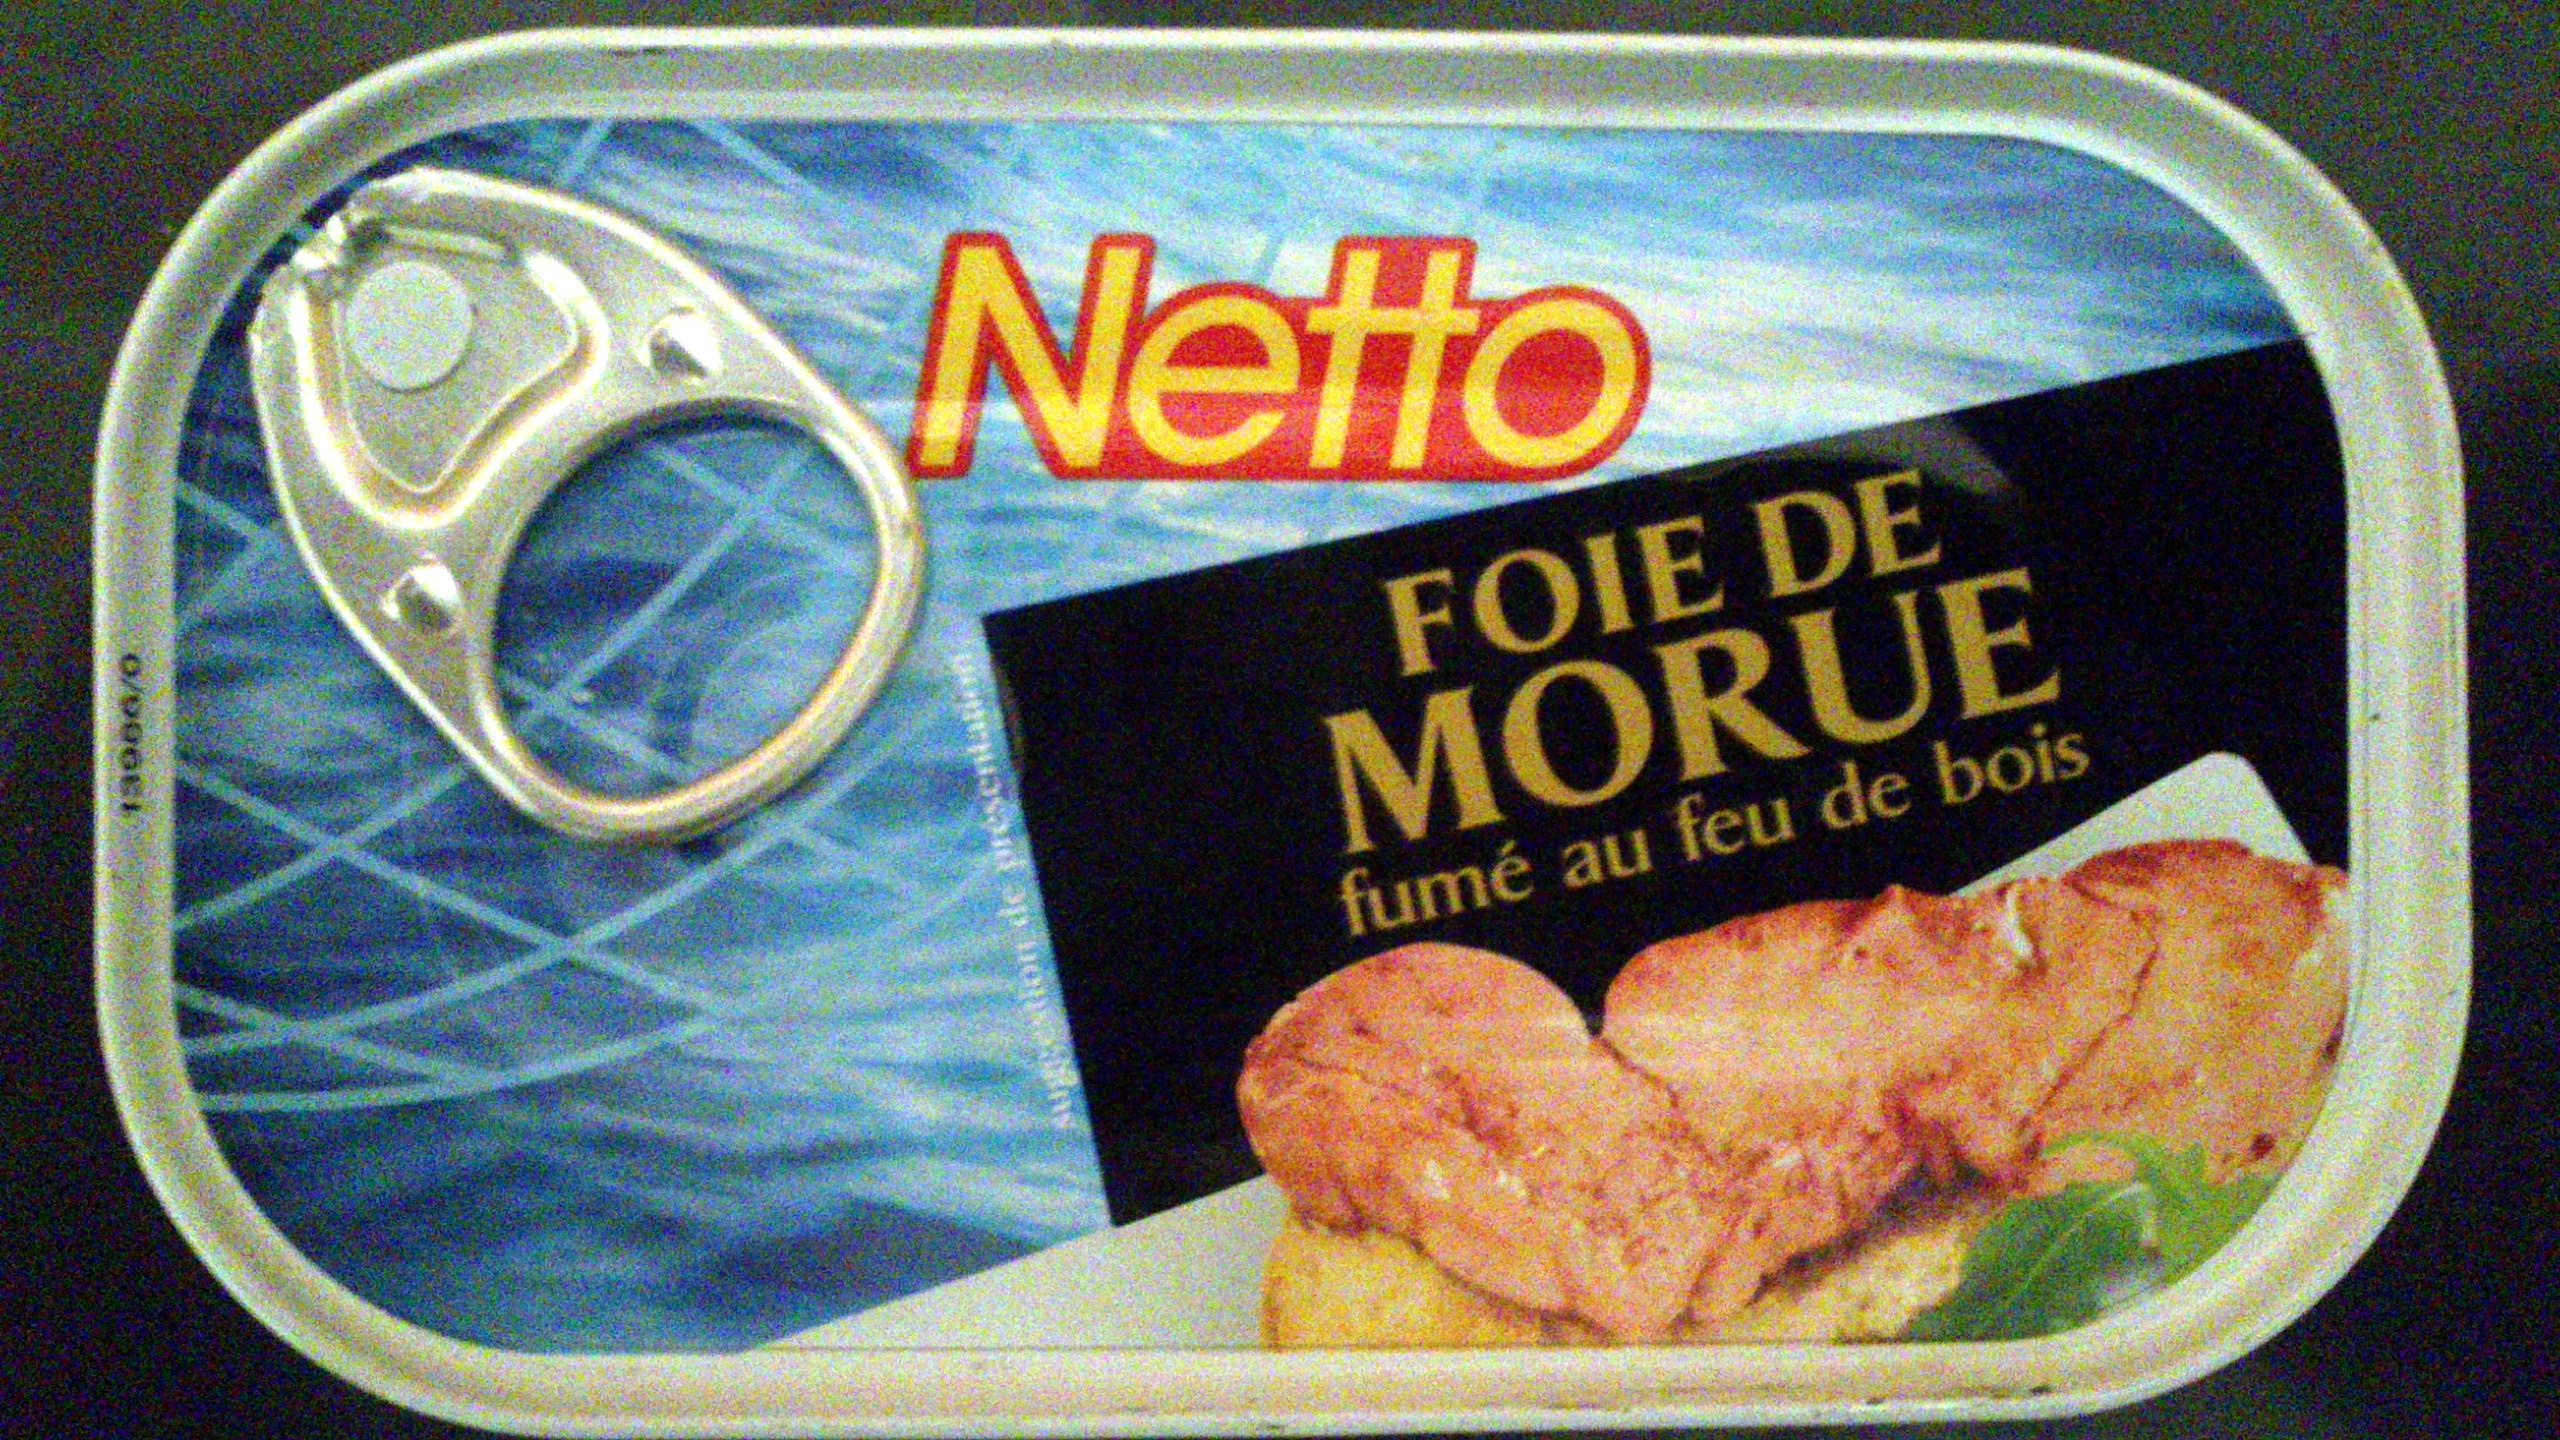 Foie de Morue - Netto - Product